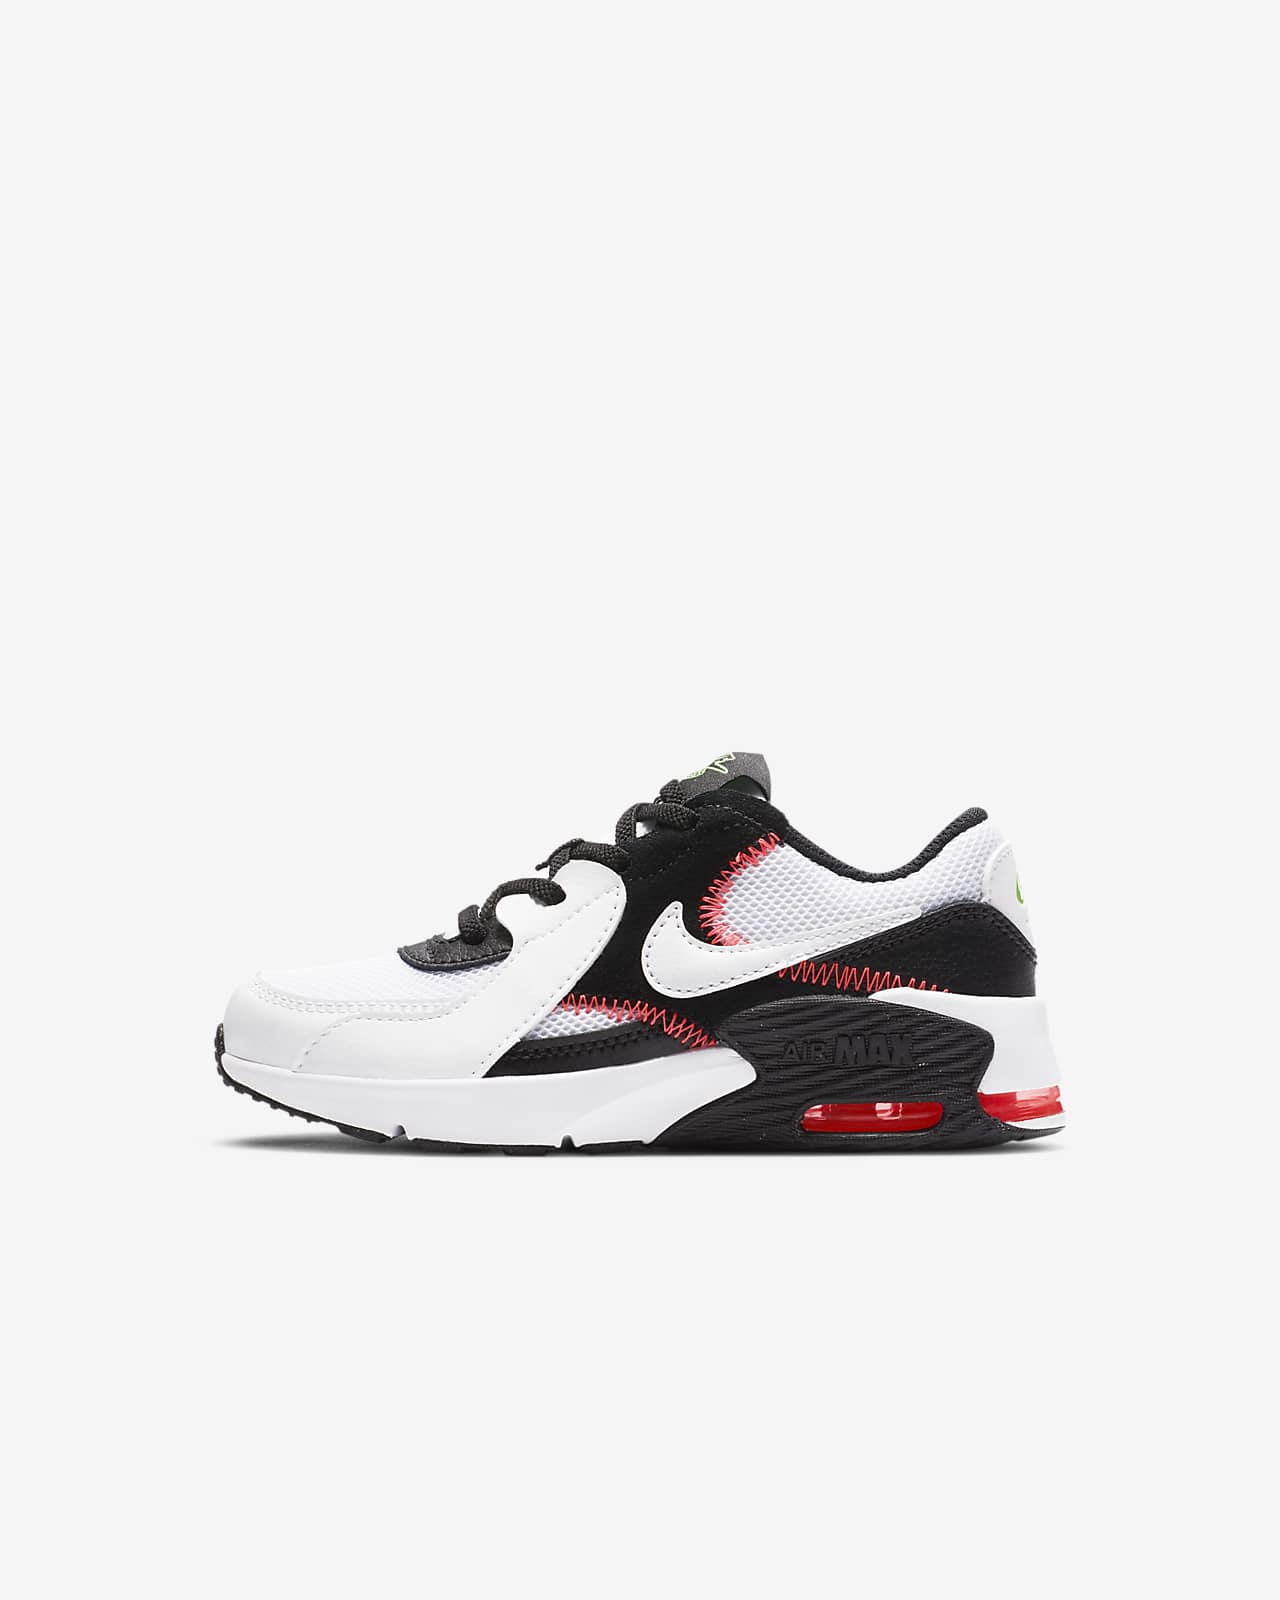 Chaussure Nike Air Max Excee pour Jeune enfant